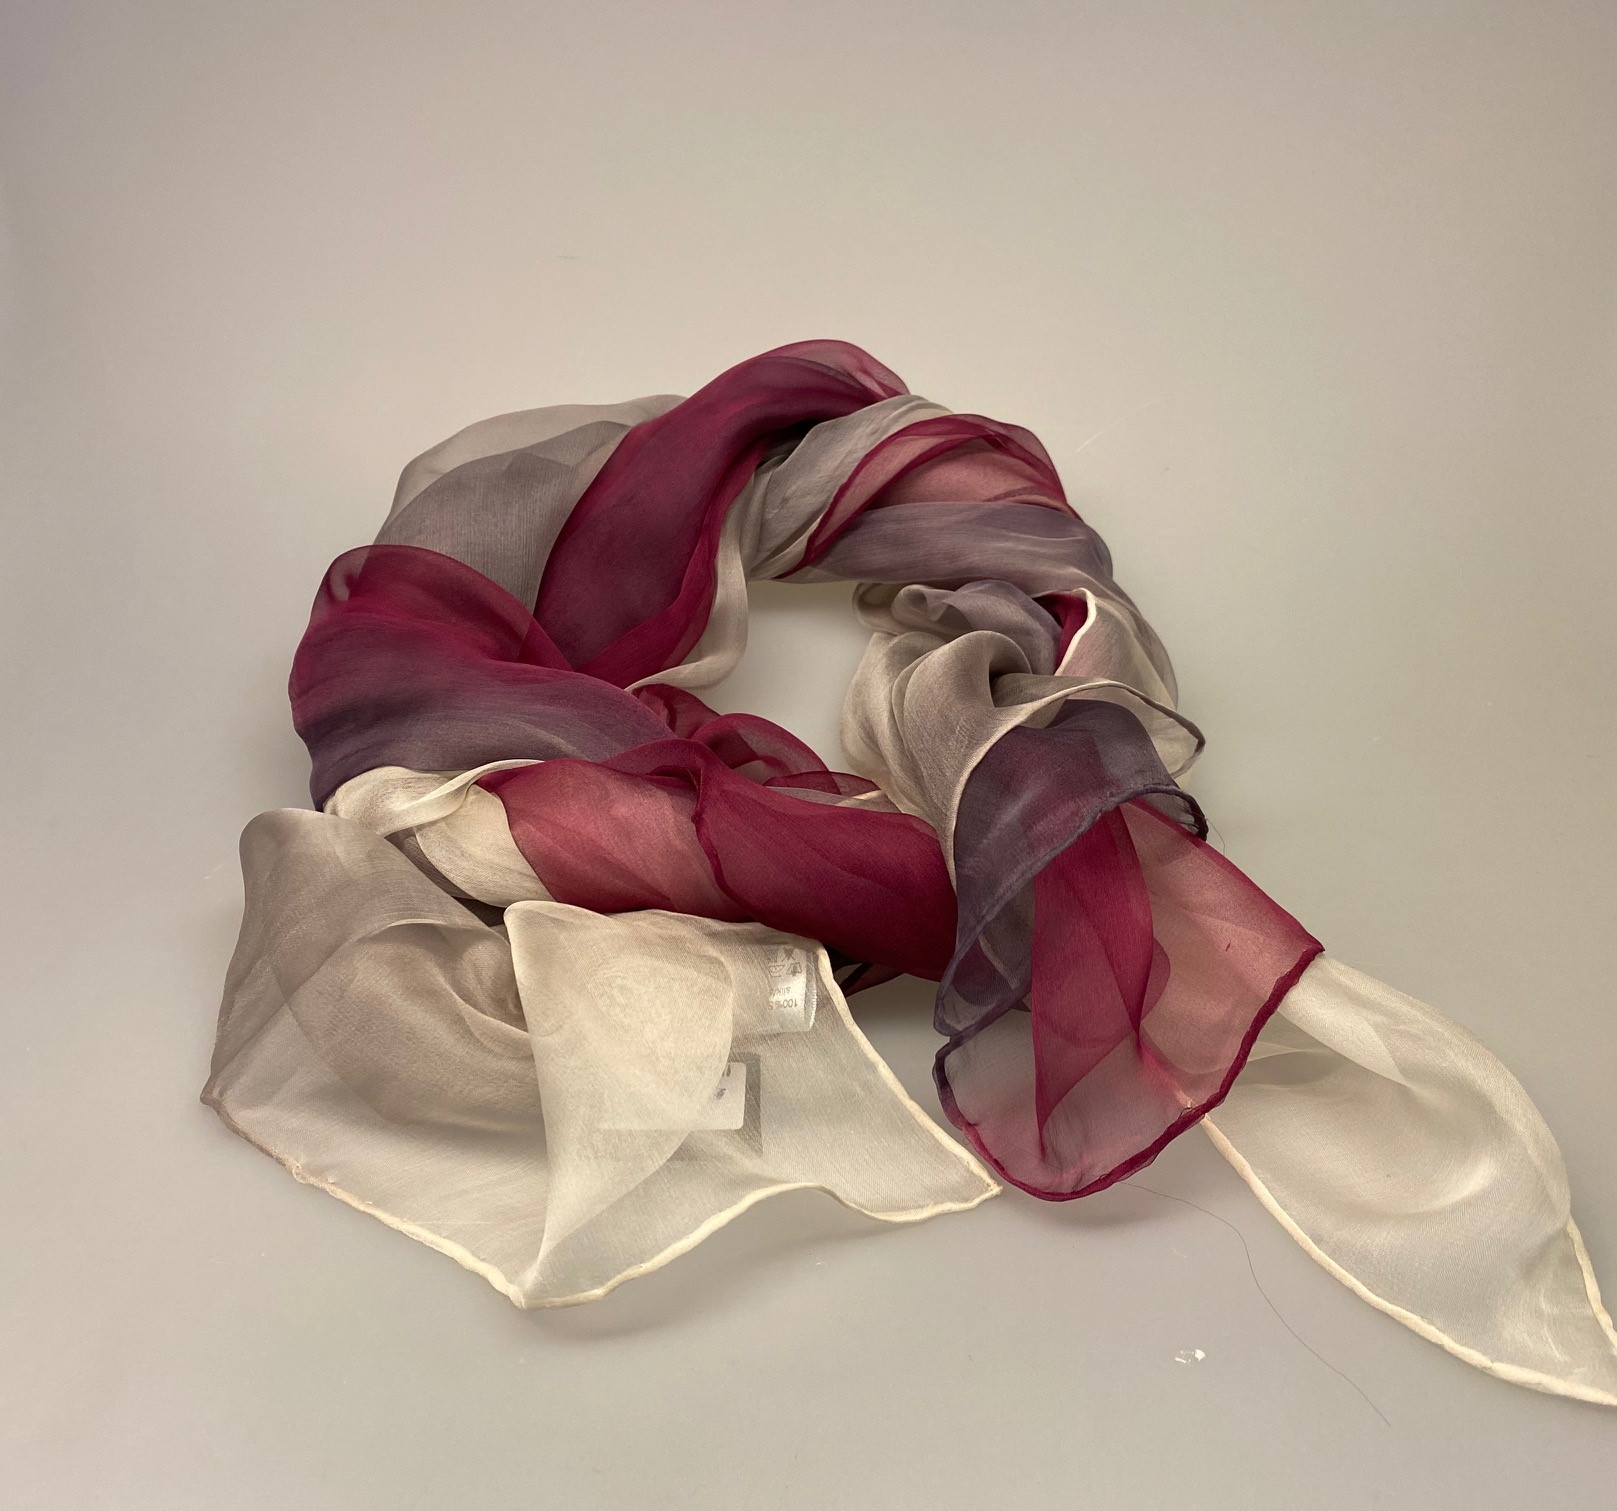 Silkechiffon 1163 XL - Lyng/Lilla/Hvid,Silke, hvid, lyngfarvet, lilla, lynglilla, rosa, silke, ren silke, silketørklæde, silkechiffon, let, stort, volumen, sjal, stola, fest, festtøj, elegant, kvalitet, flot, kor, gave, gaveide, rund fødselsdag, biti, ribe